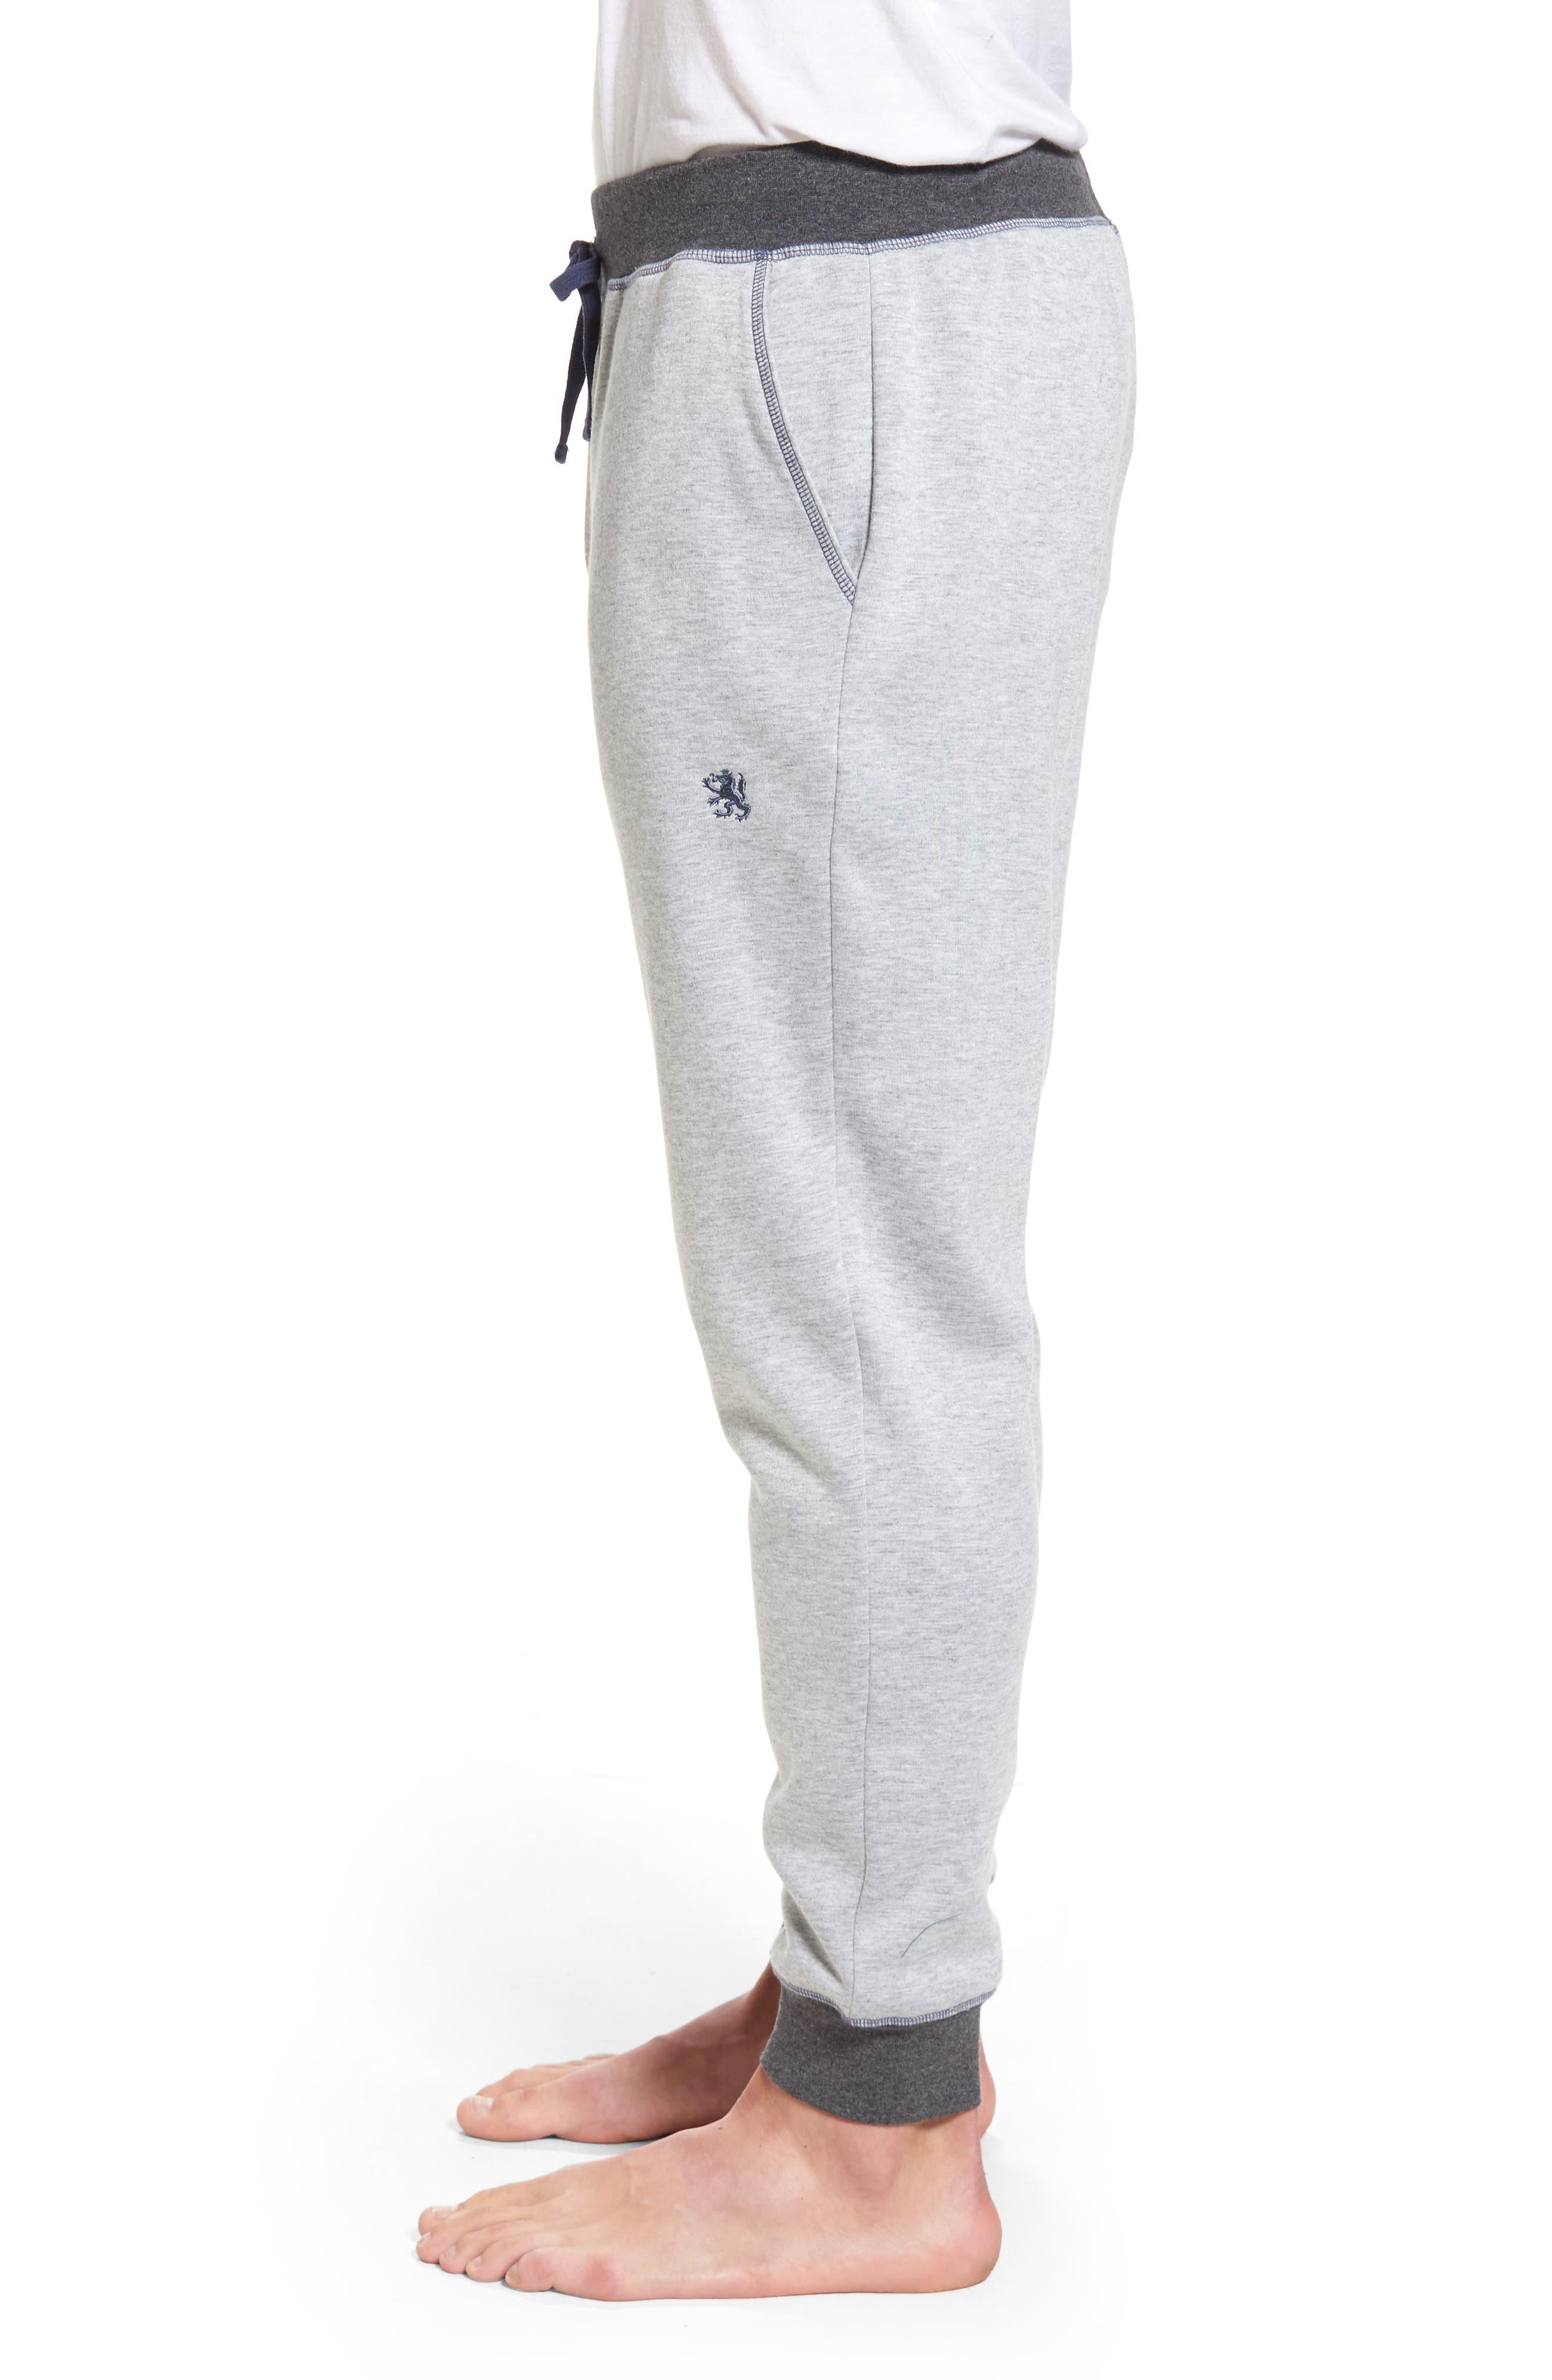 Double Take Knit Lounge Pants,                             Alternate thumbnail 3, color,                             025